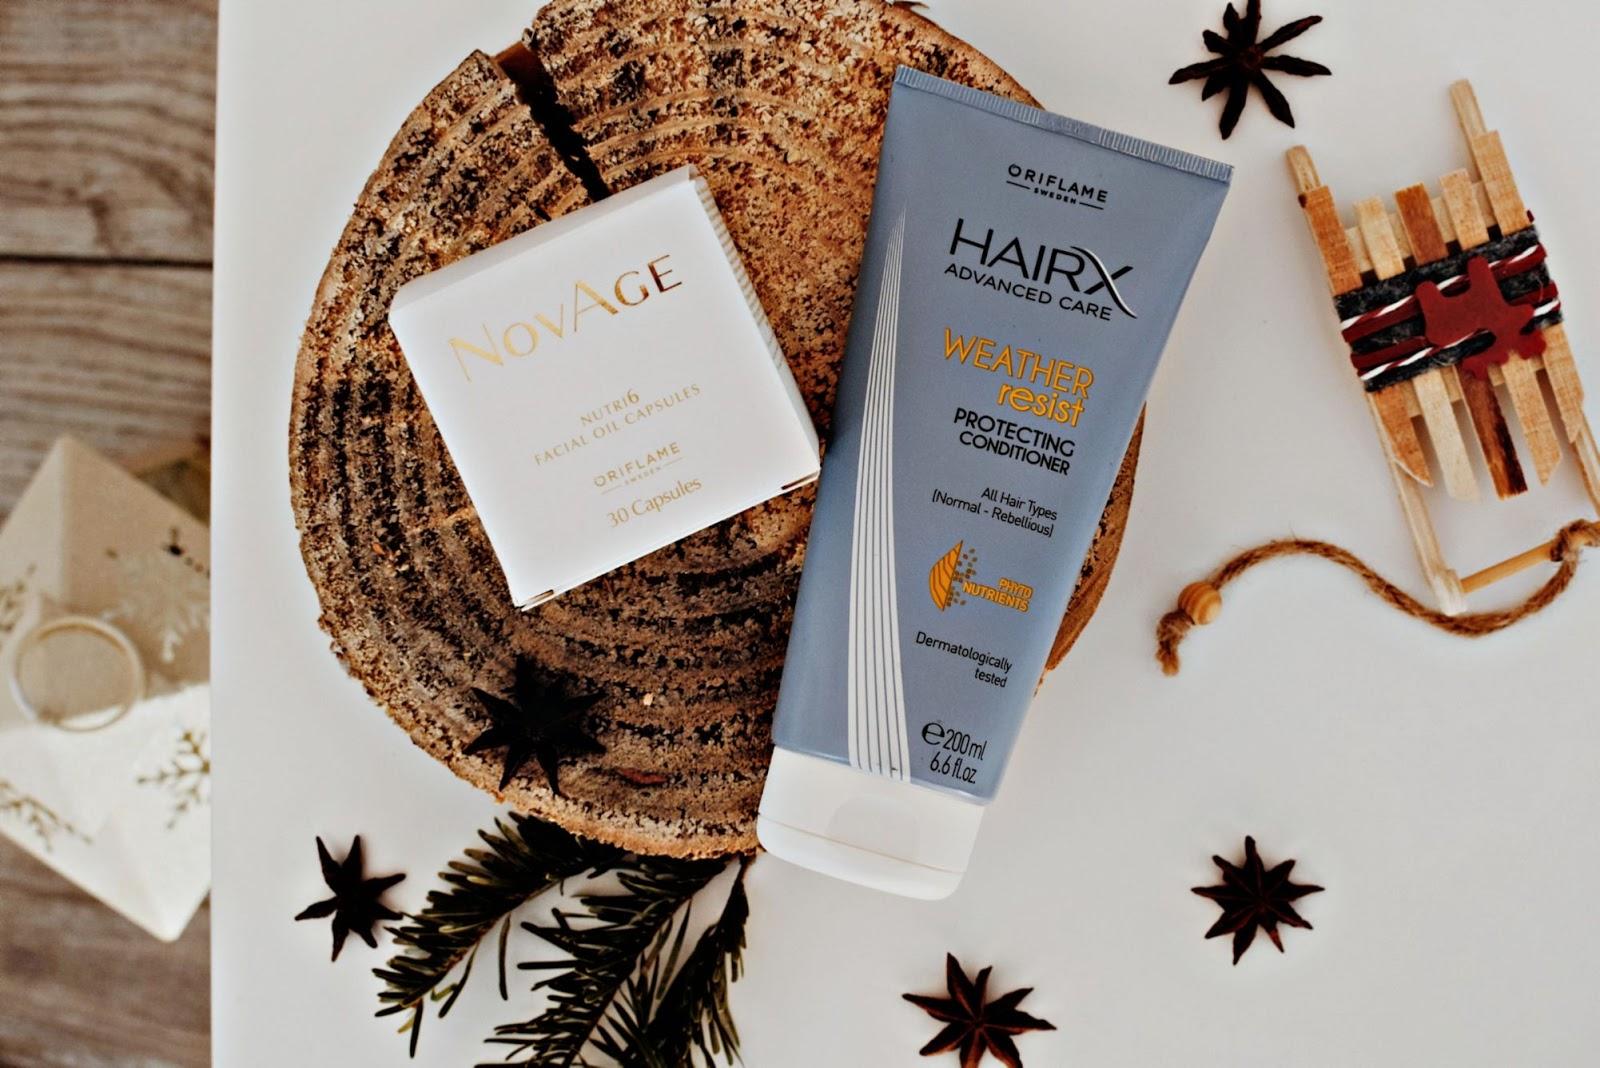 Odżywka HairX Advanced Care Weather Resist, Oriflame